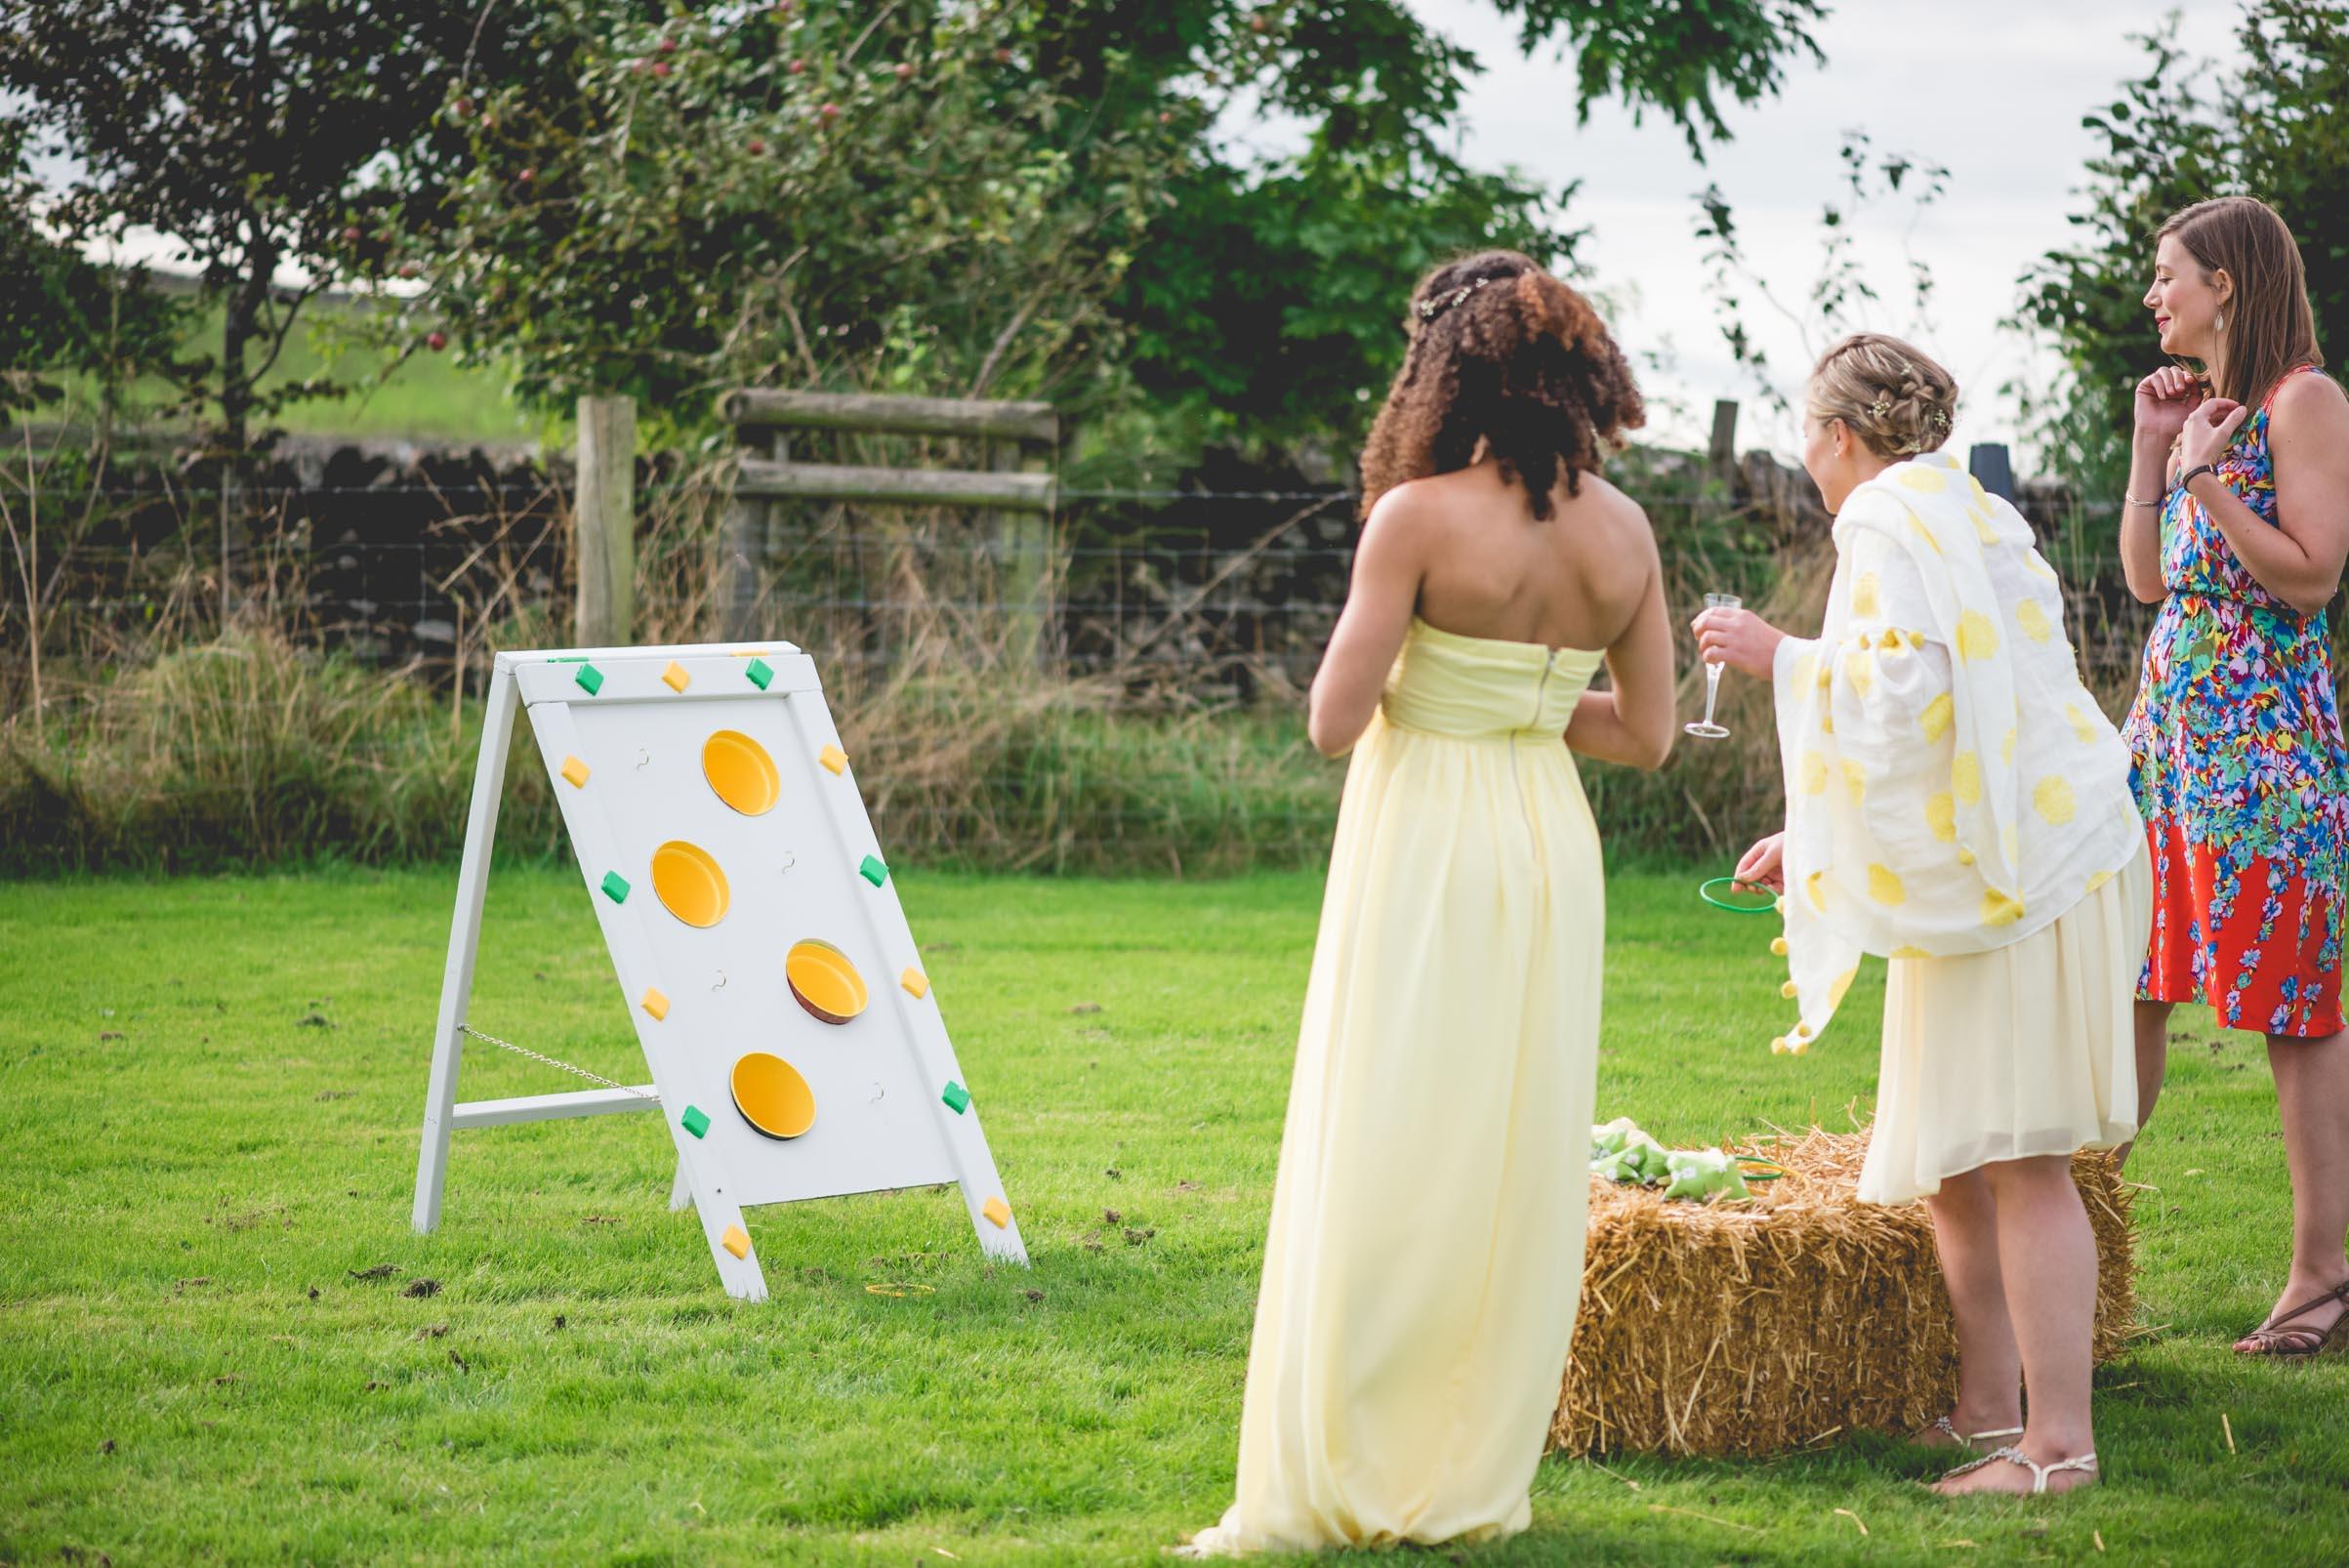 Peak+district+farm+wedding+lower+damgate+photographer-157.jpg